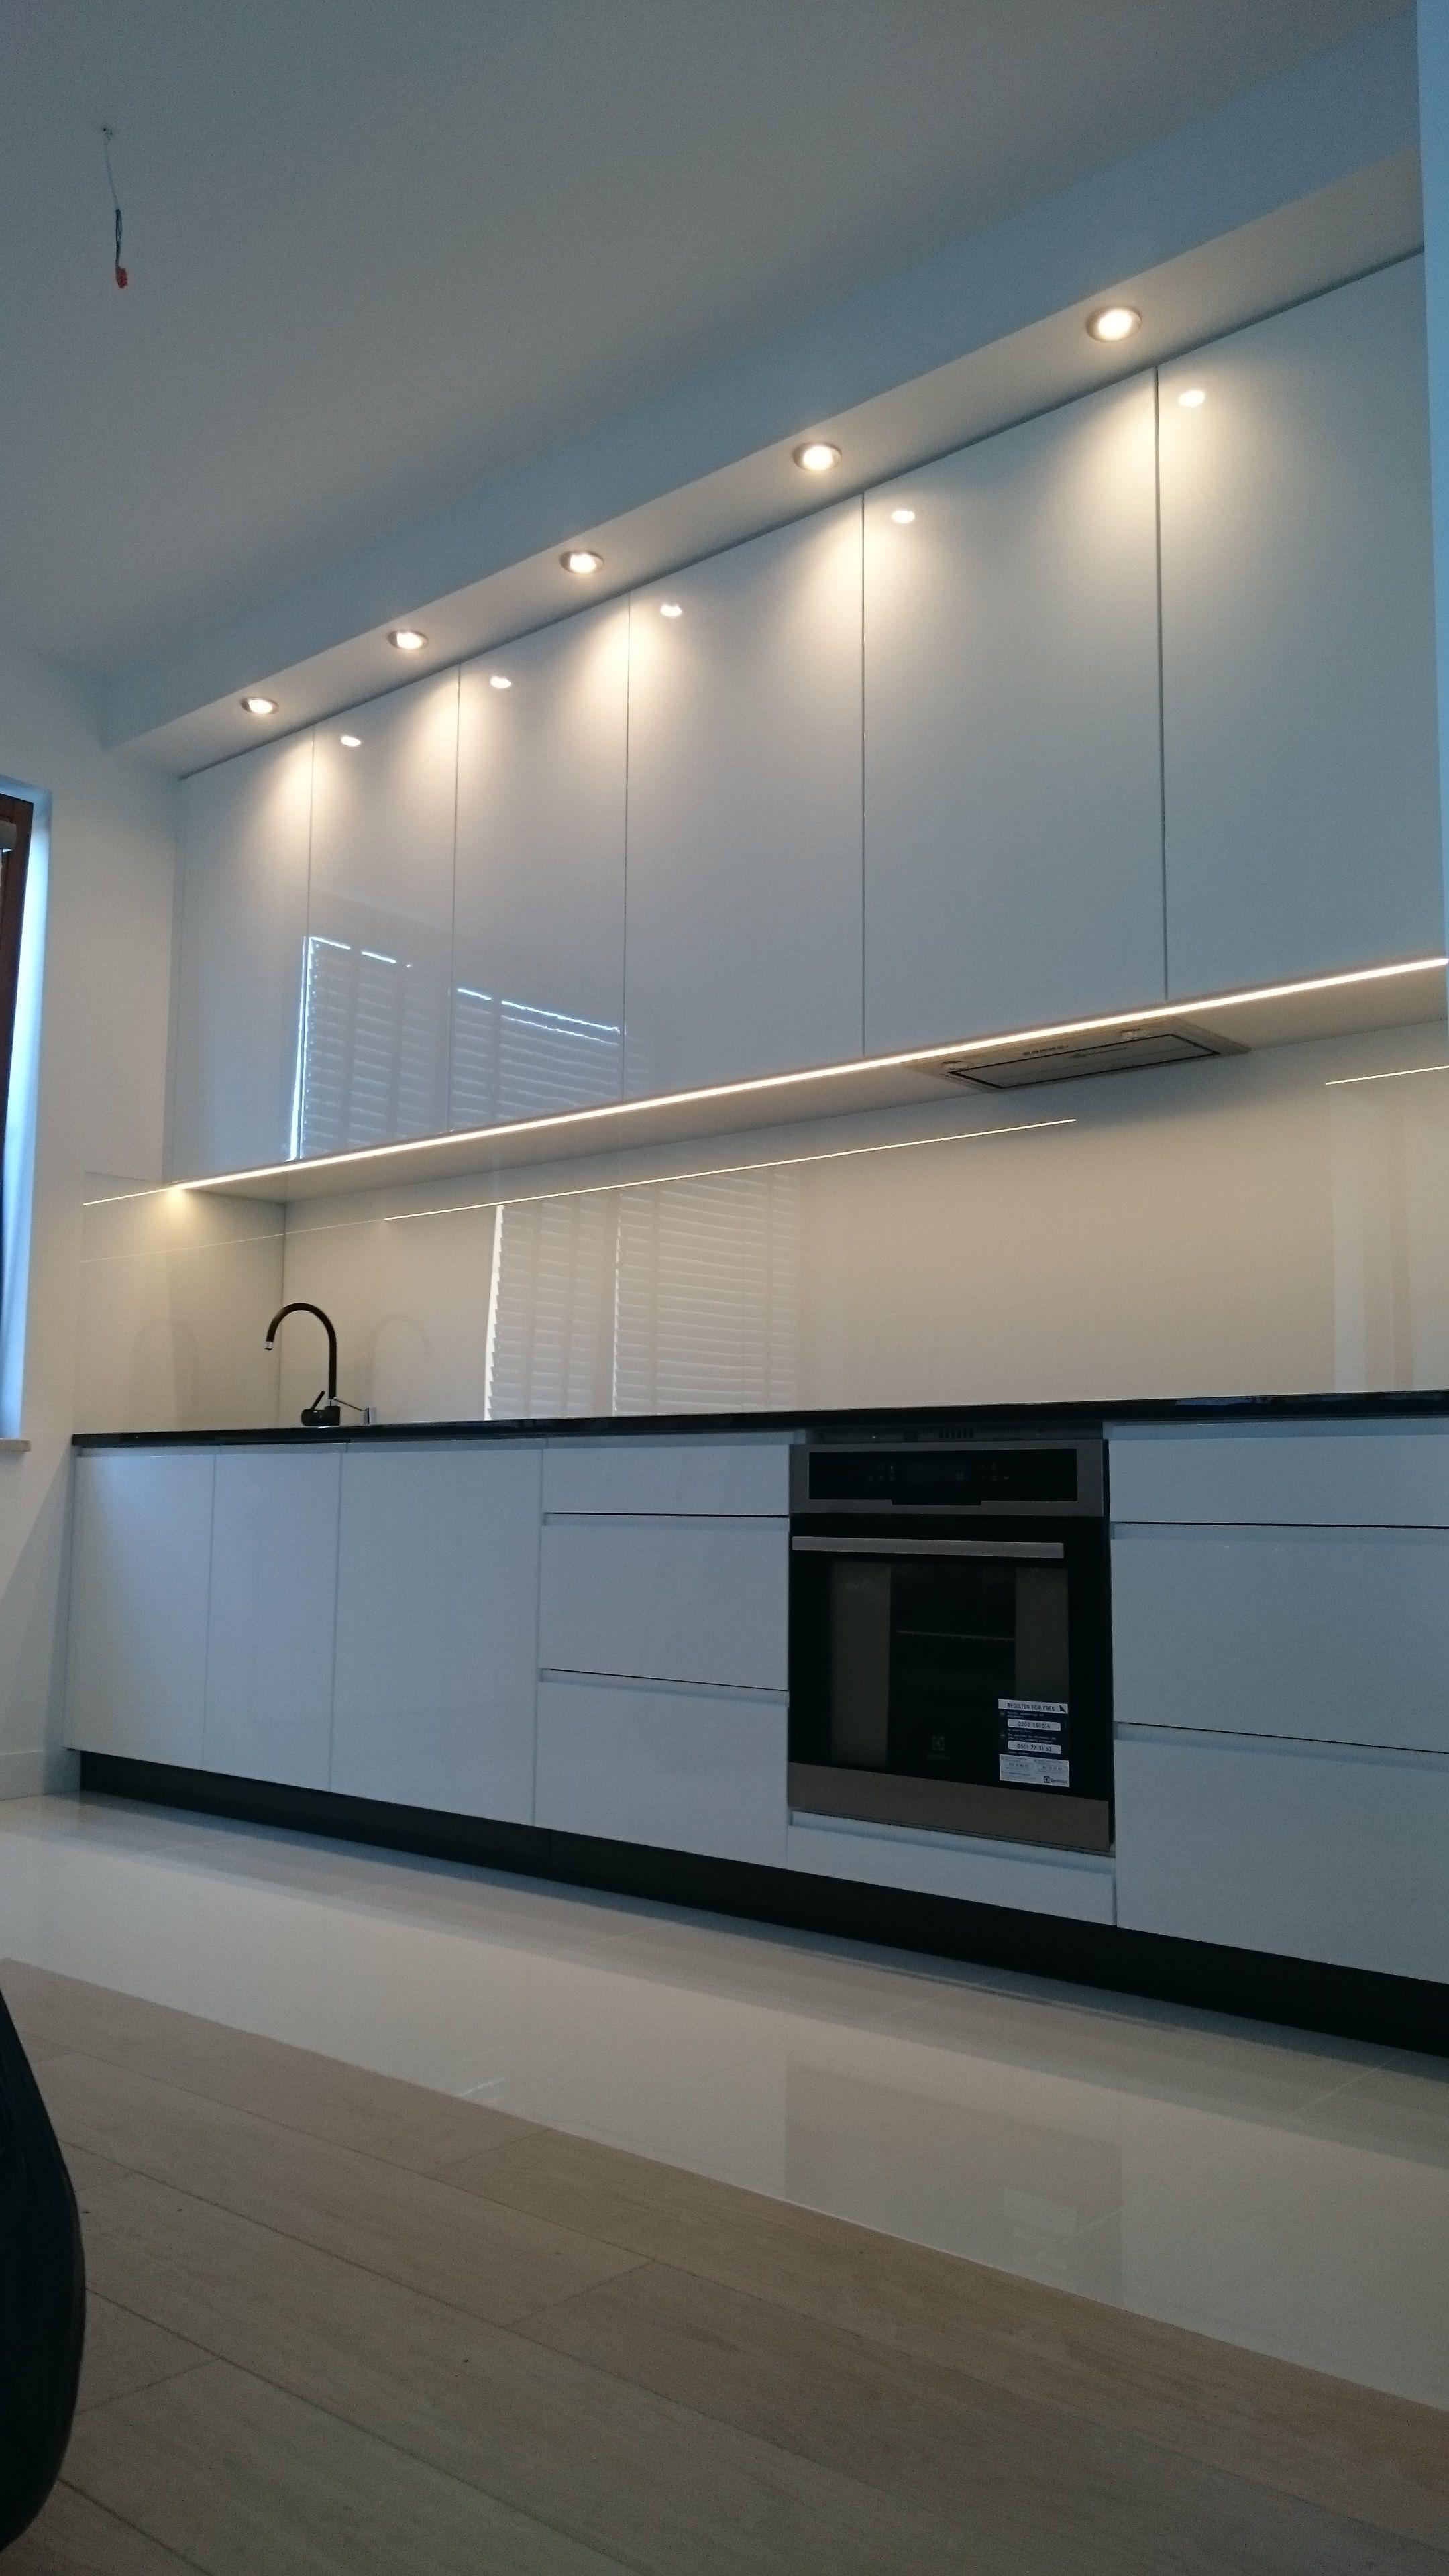 Galeria Mebli Na Wymiar Gdansk Szafy Meble Kuchenne I Lazienkowe Kitchen Cabinets Home Decor Decor